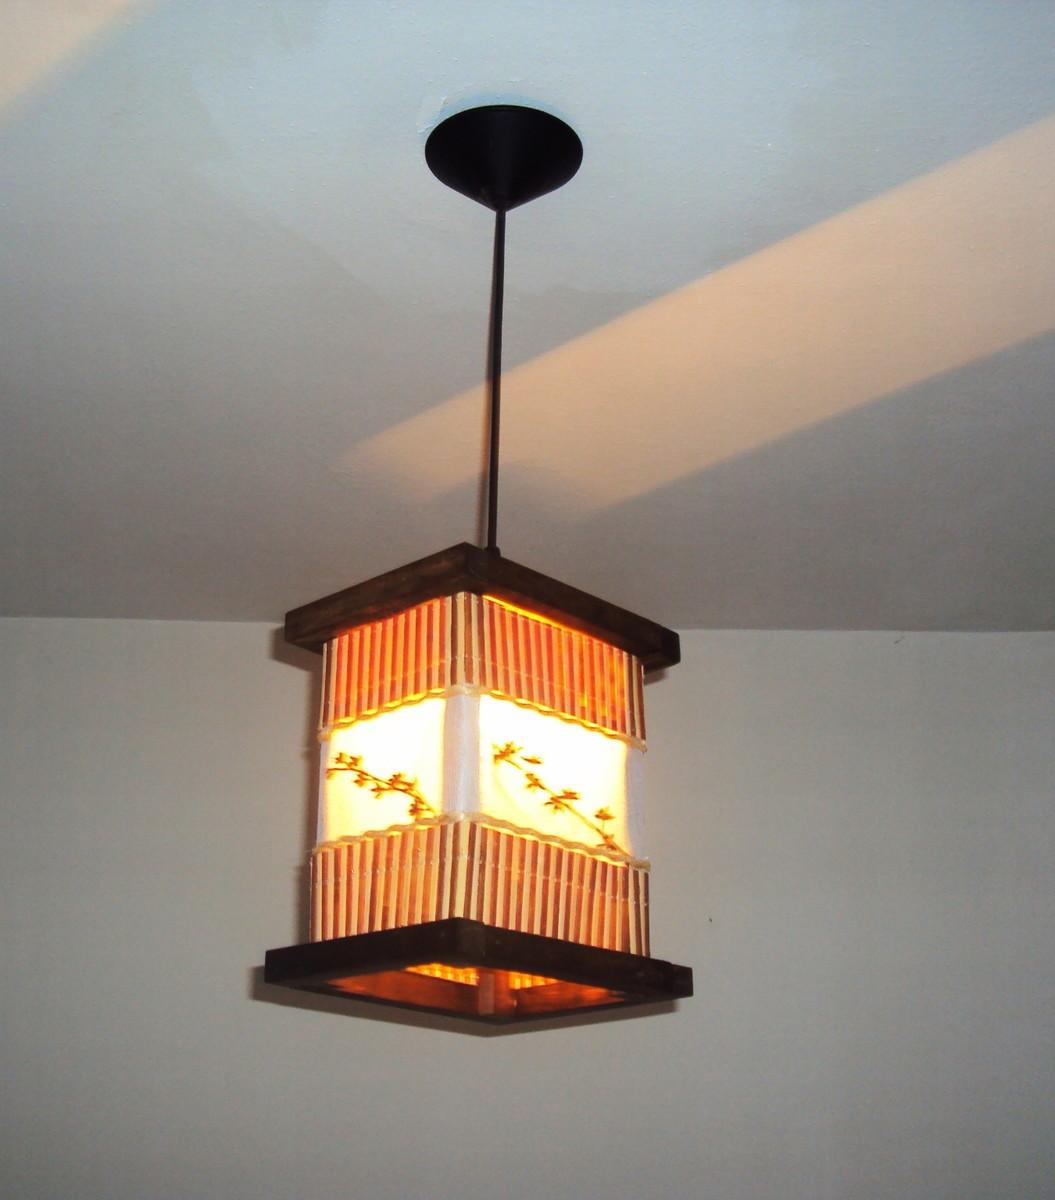 de teto lustre rustico bambu luminaria de teto lustre rustico bambu #B25819 1055x1200